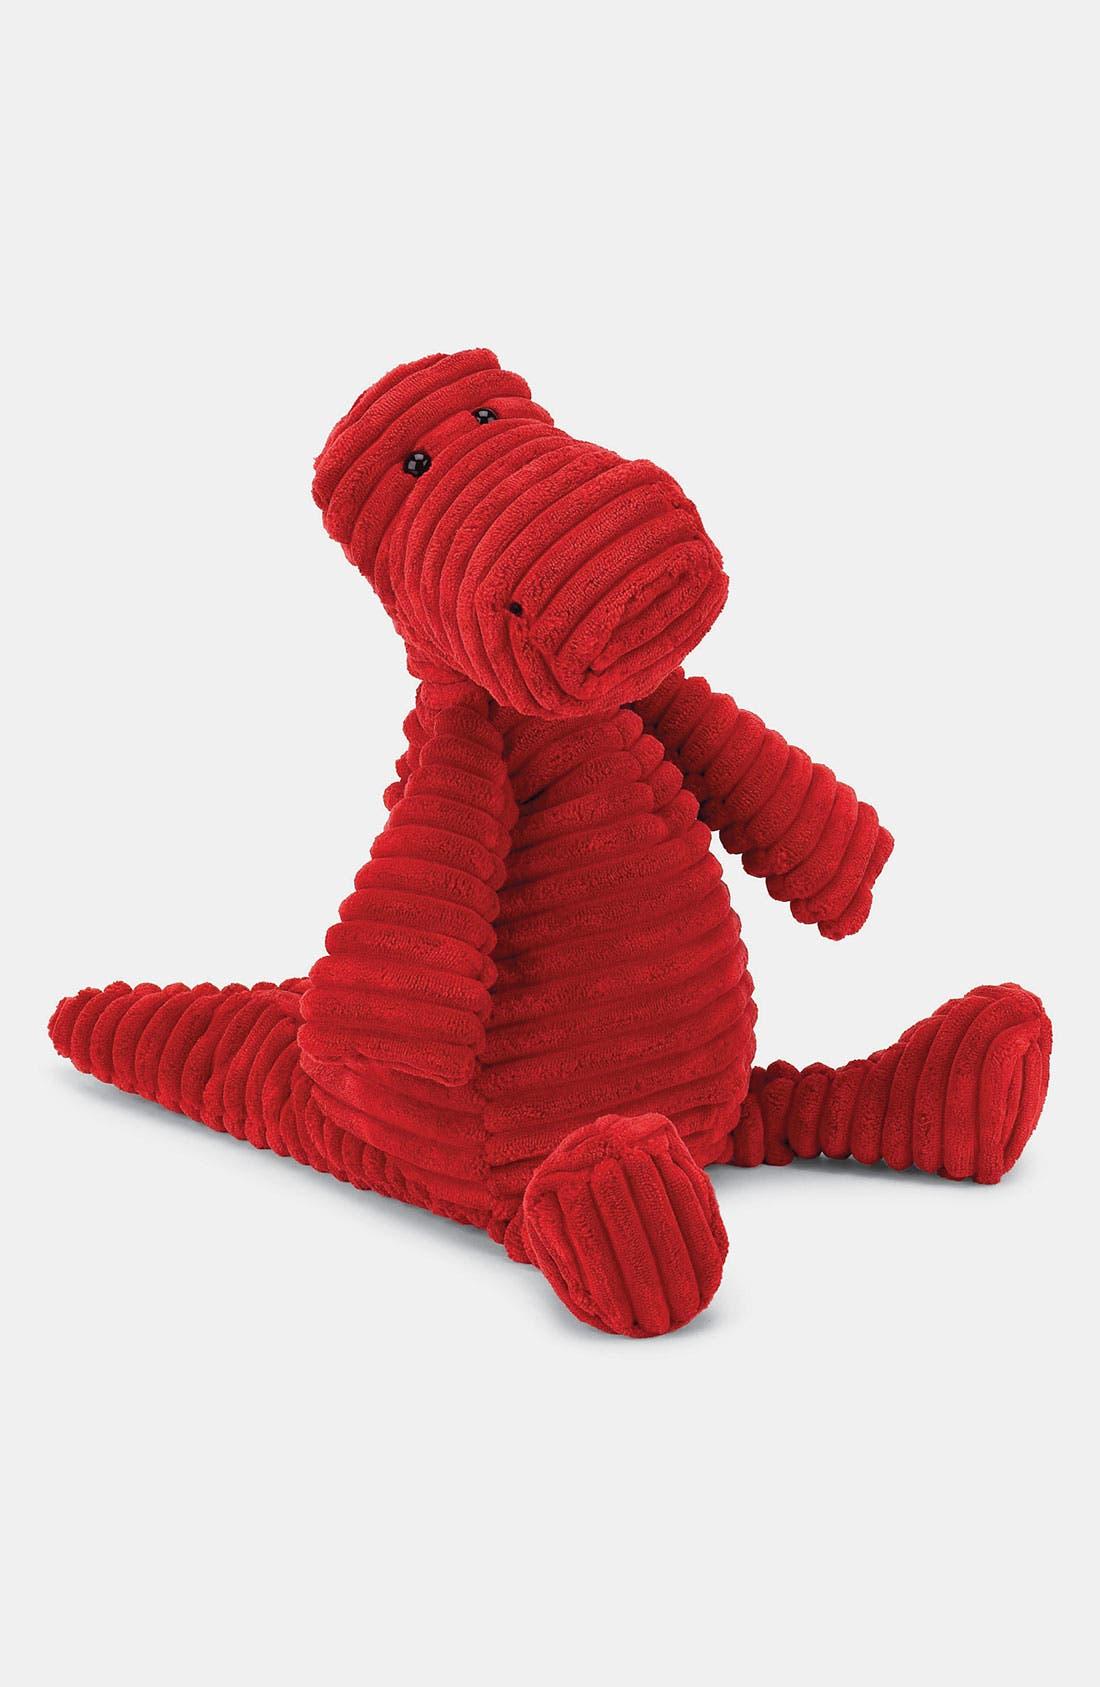 Alternate Image 1 Selected - Jellycat 'Cordy Roy' Dinosaur Stuffed Animal